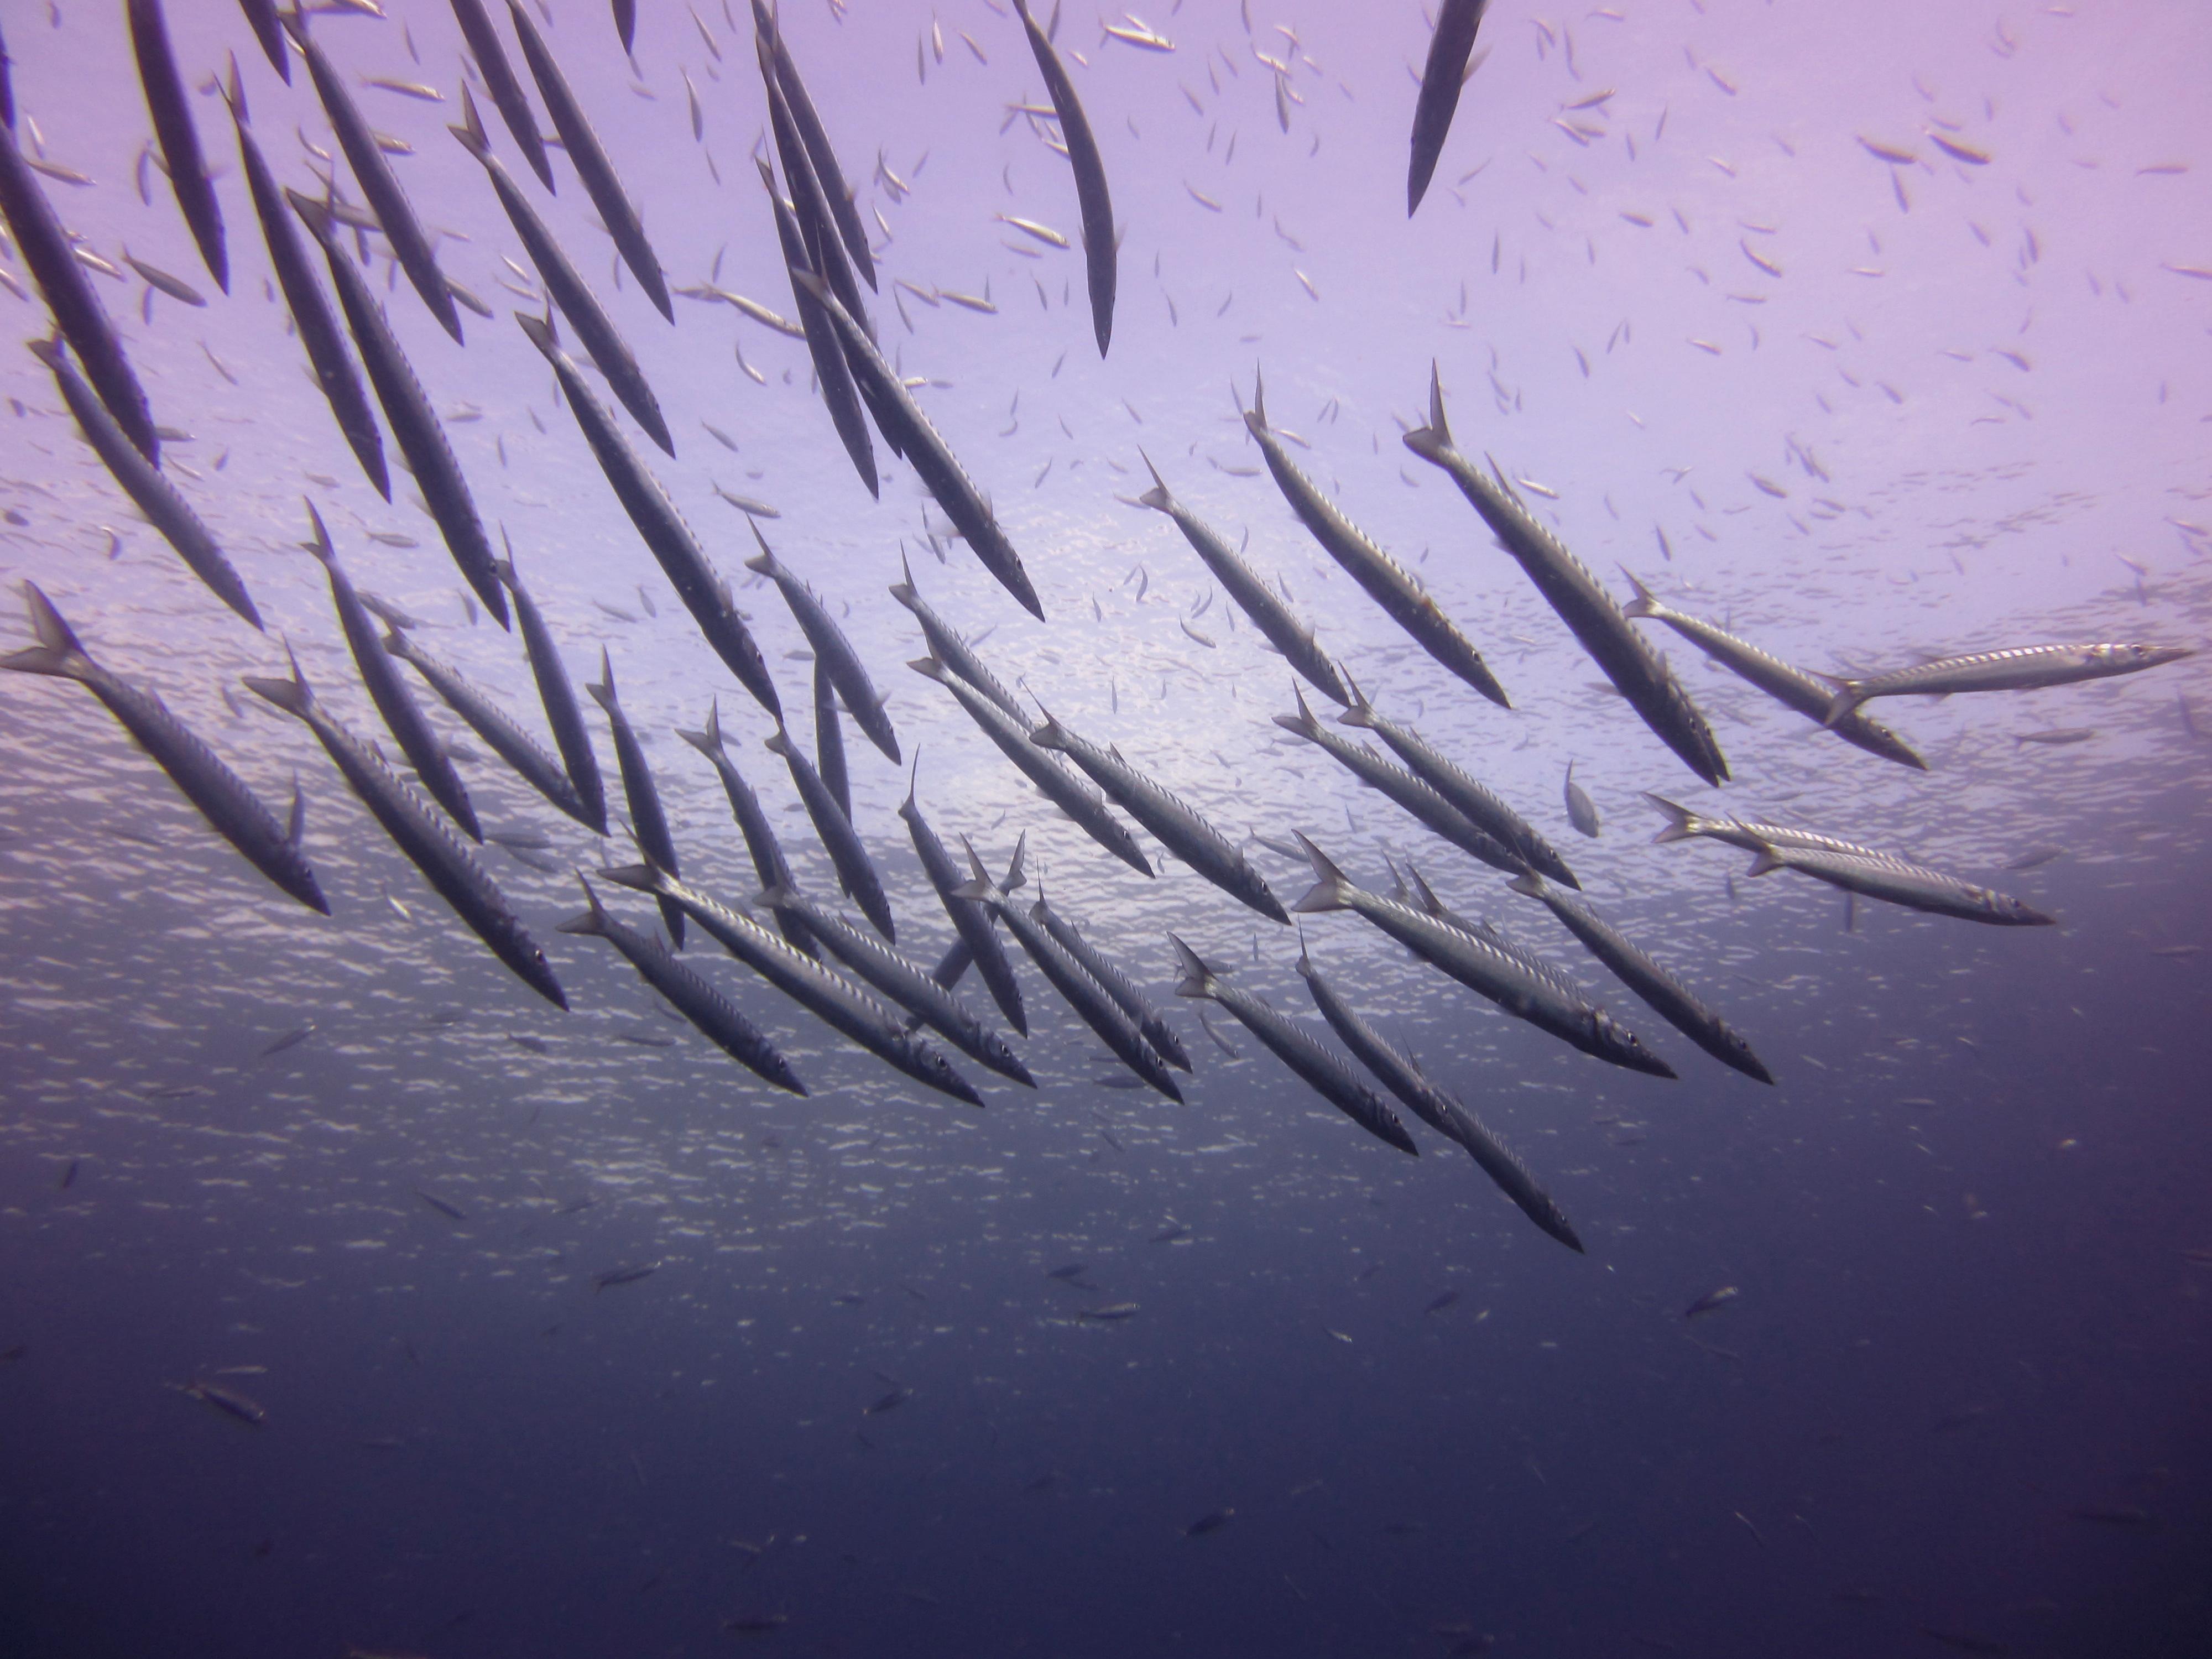 Diving-Tenerife-Aquatic-Life-Sharks-Sting-Rays-Fish (92)